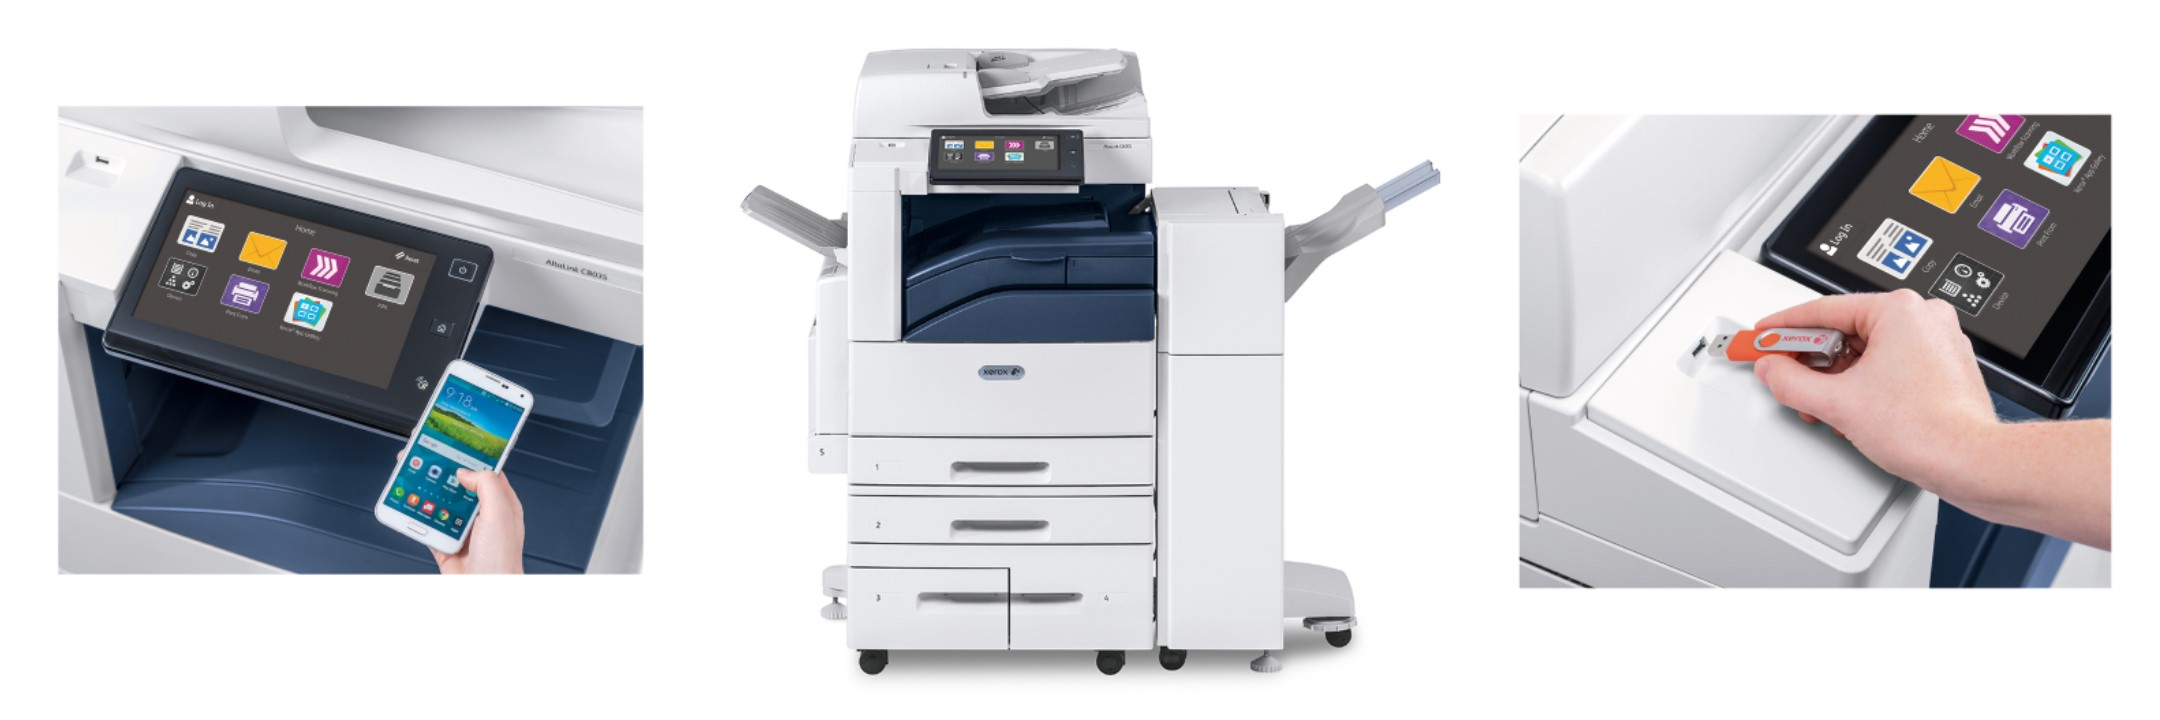 Seria de imprimante Altalink c8000